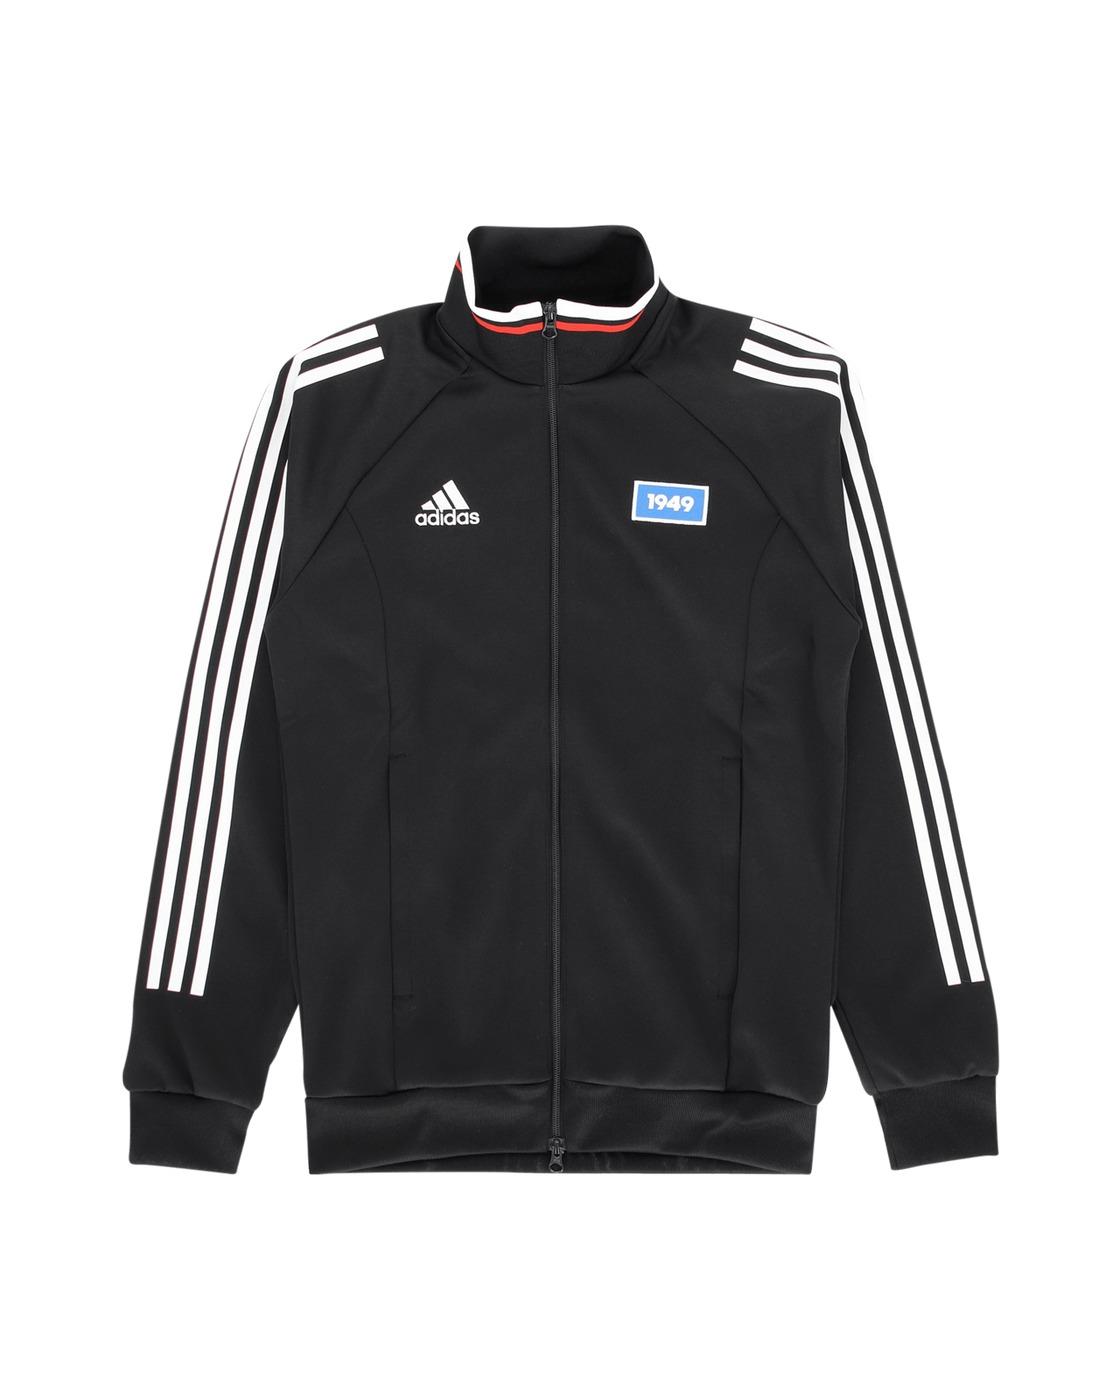 Adidas Originals Adidas X Football 70a Track Jacket Black